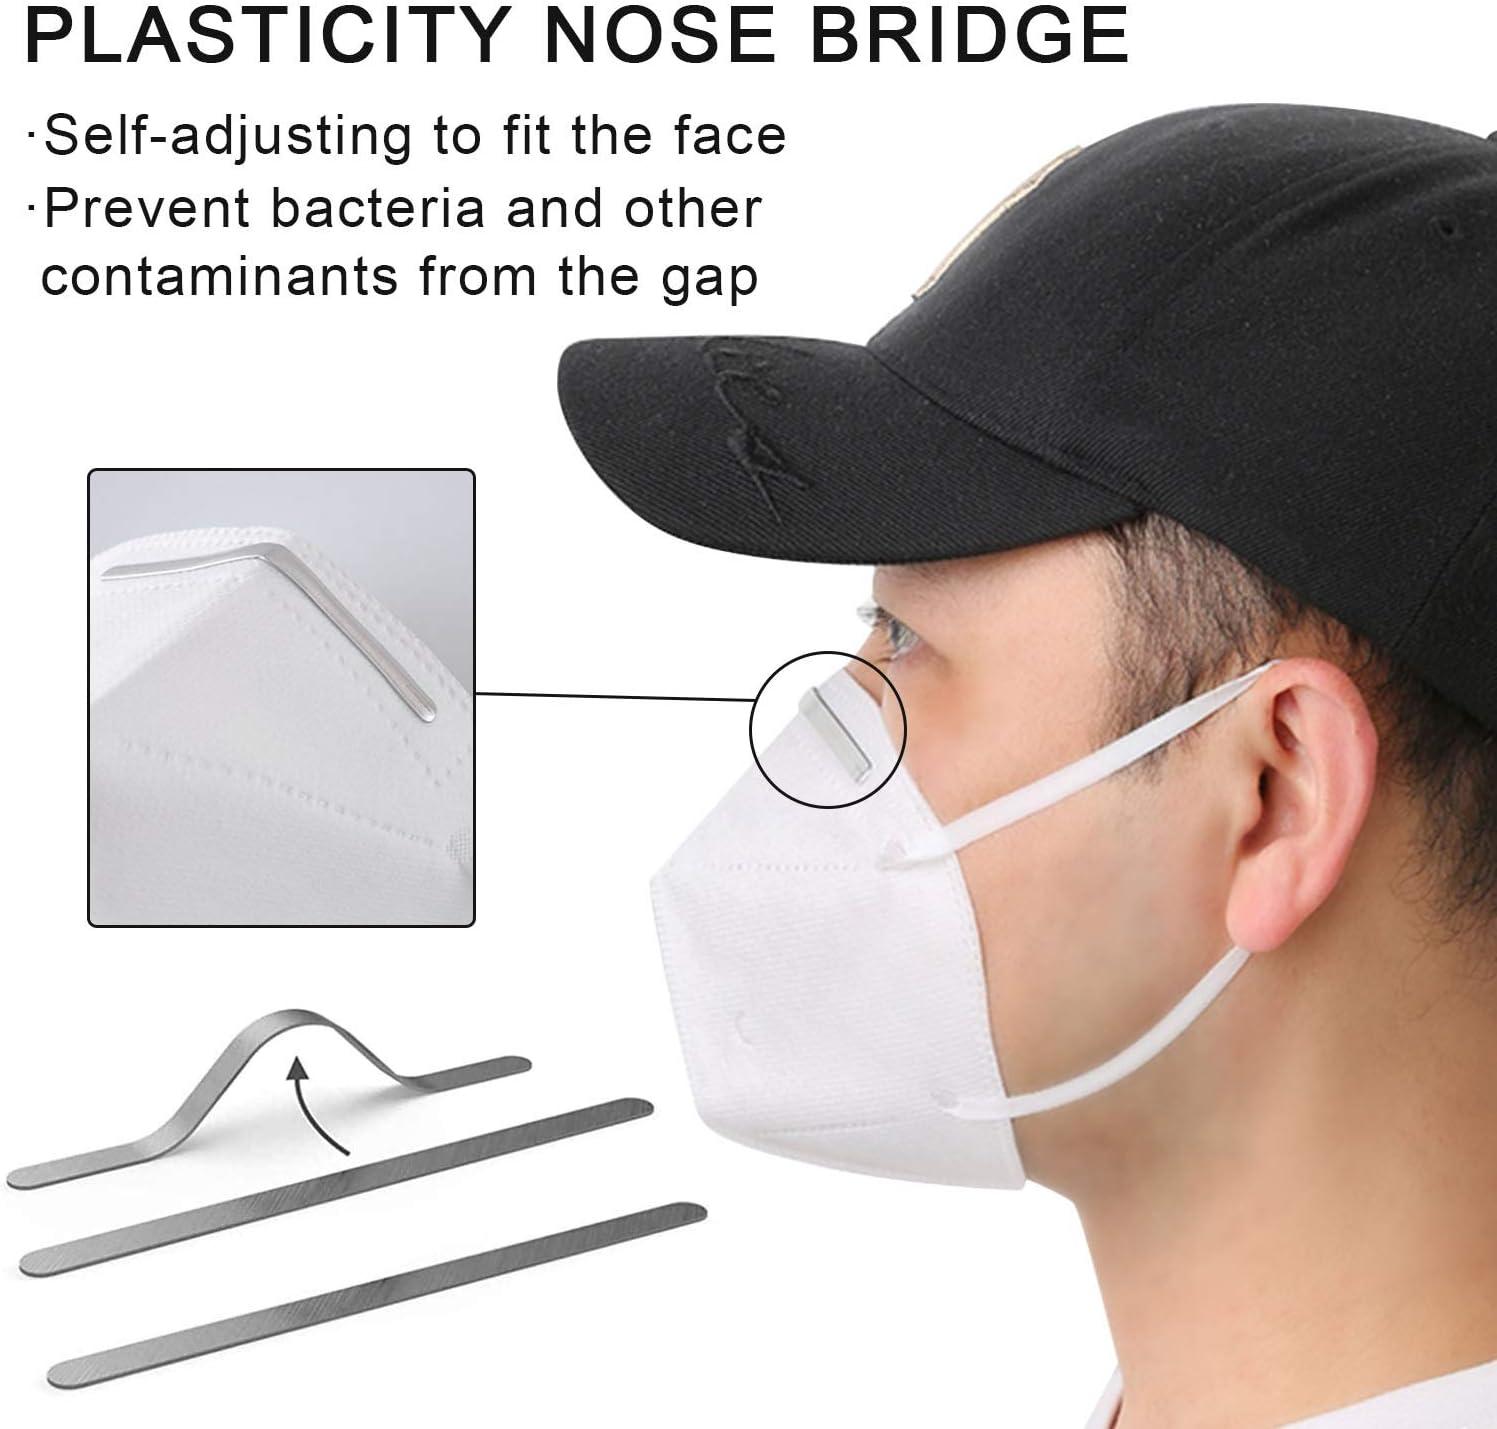 100pcs Nose Bridge Strips Adjustable Metal Strips Straps Nose Clips Face DIY Making Accessories for Sewing Crafts Aluminum Nose Bridge Wire Bracket